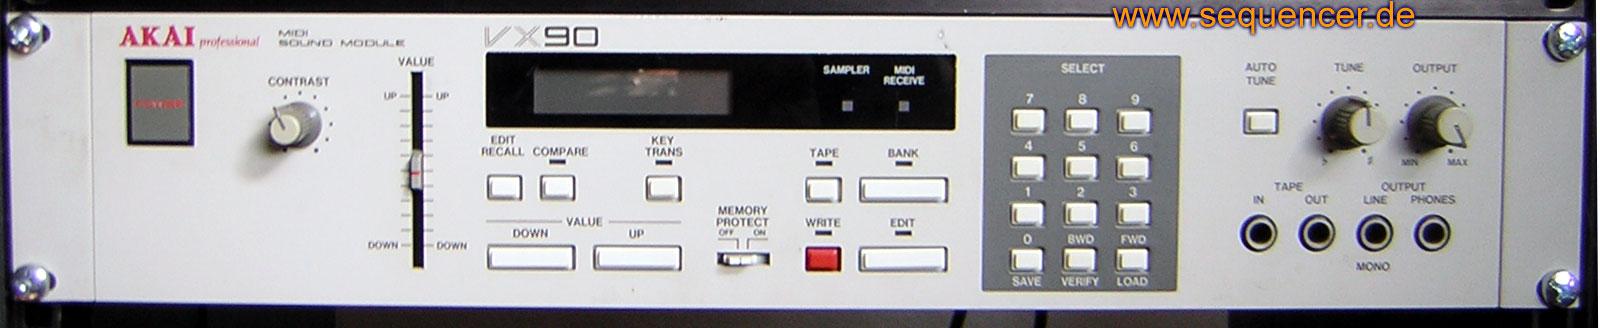 Akai AX73, VX90 synthesizer